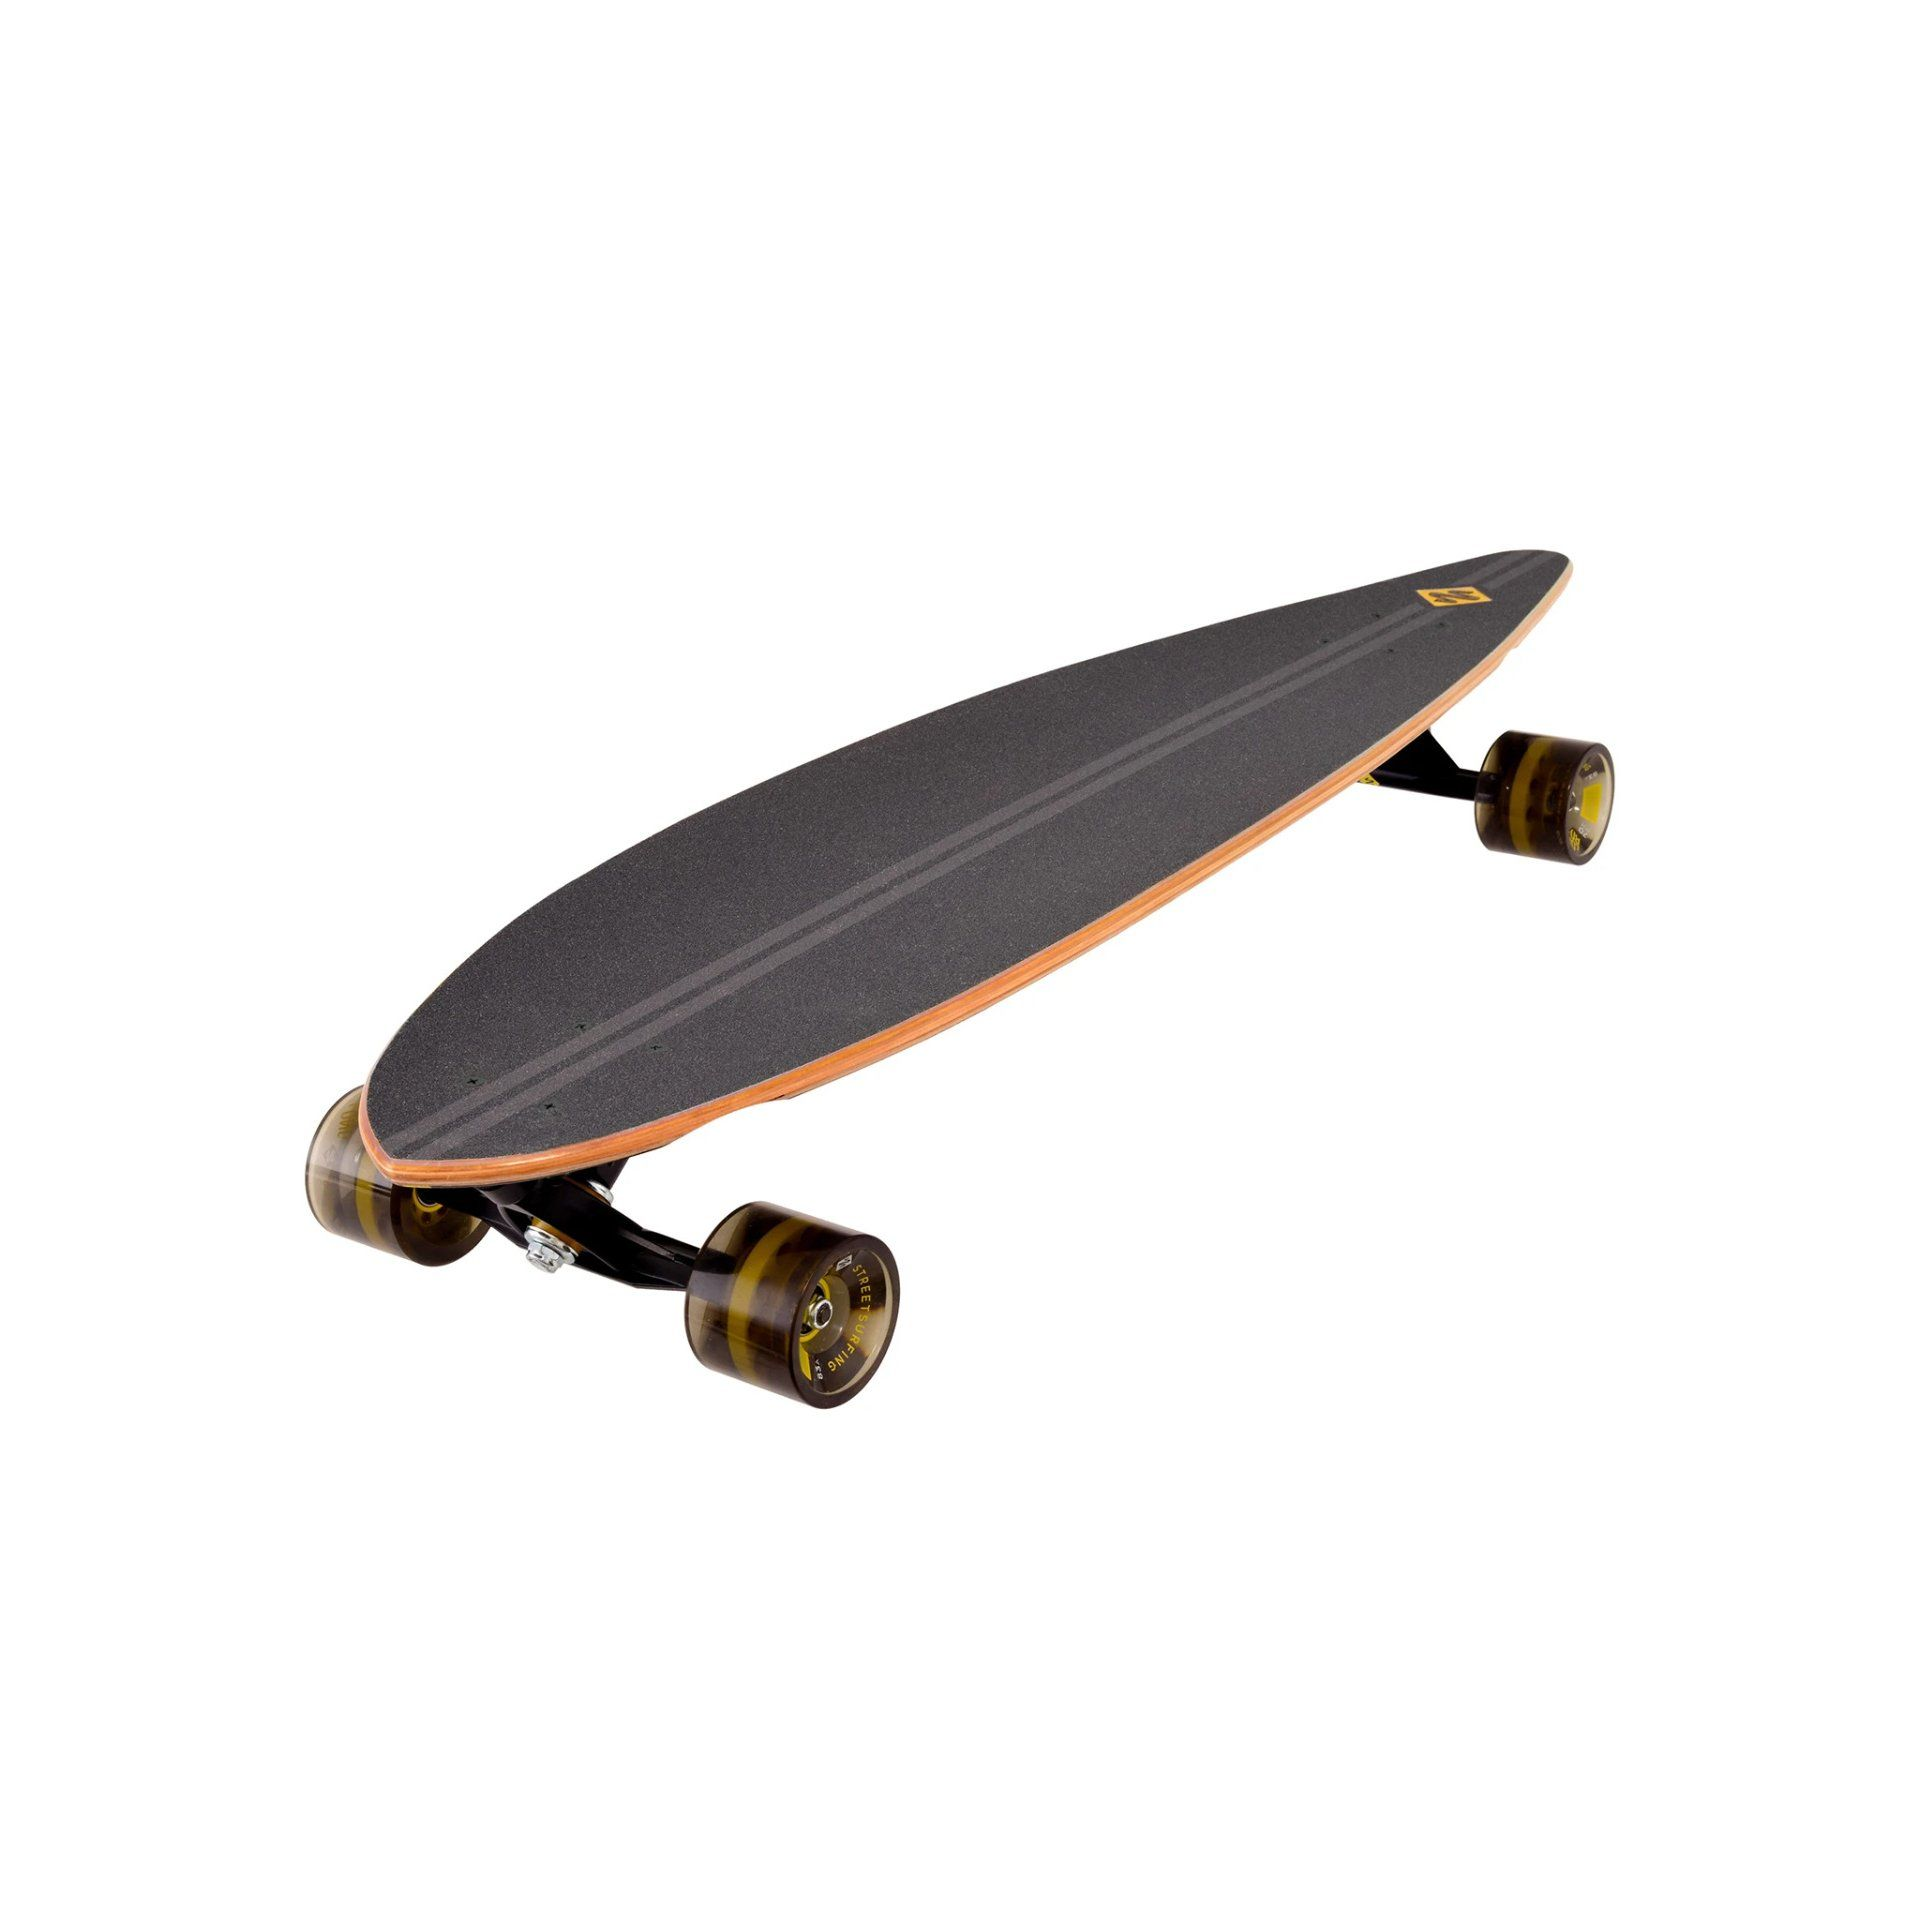 "LONGBOARD STREET SURFING PINTAIL 40"" ROAD LINE CAŁOŚĆ"